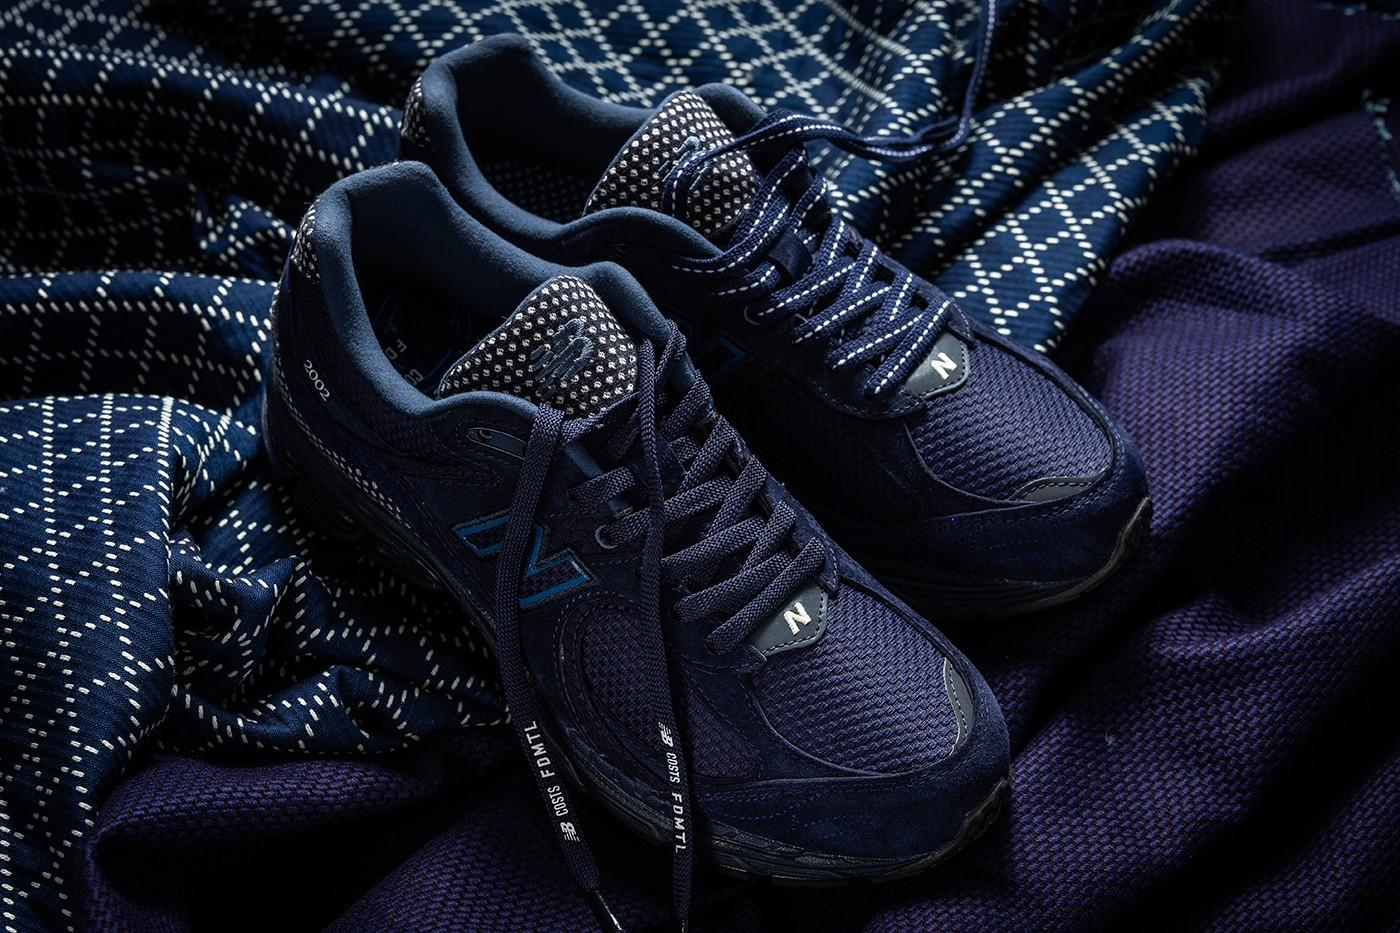 COSTS x FDMTL x New Balance 2002R 全新联乘鞋款发售情报公开